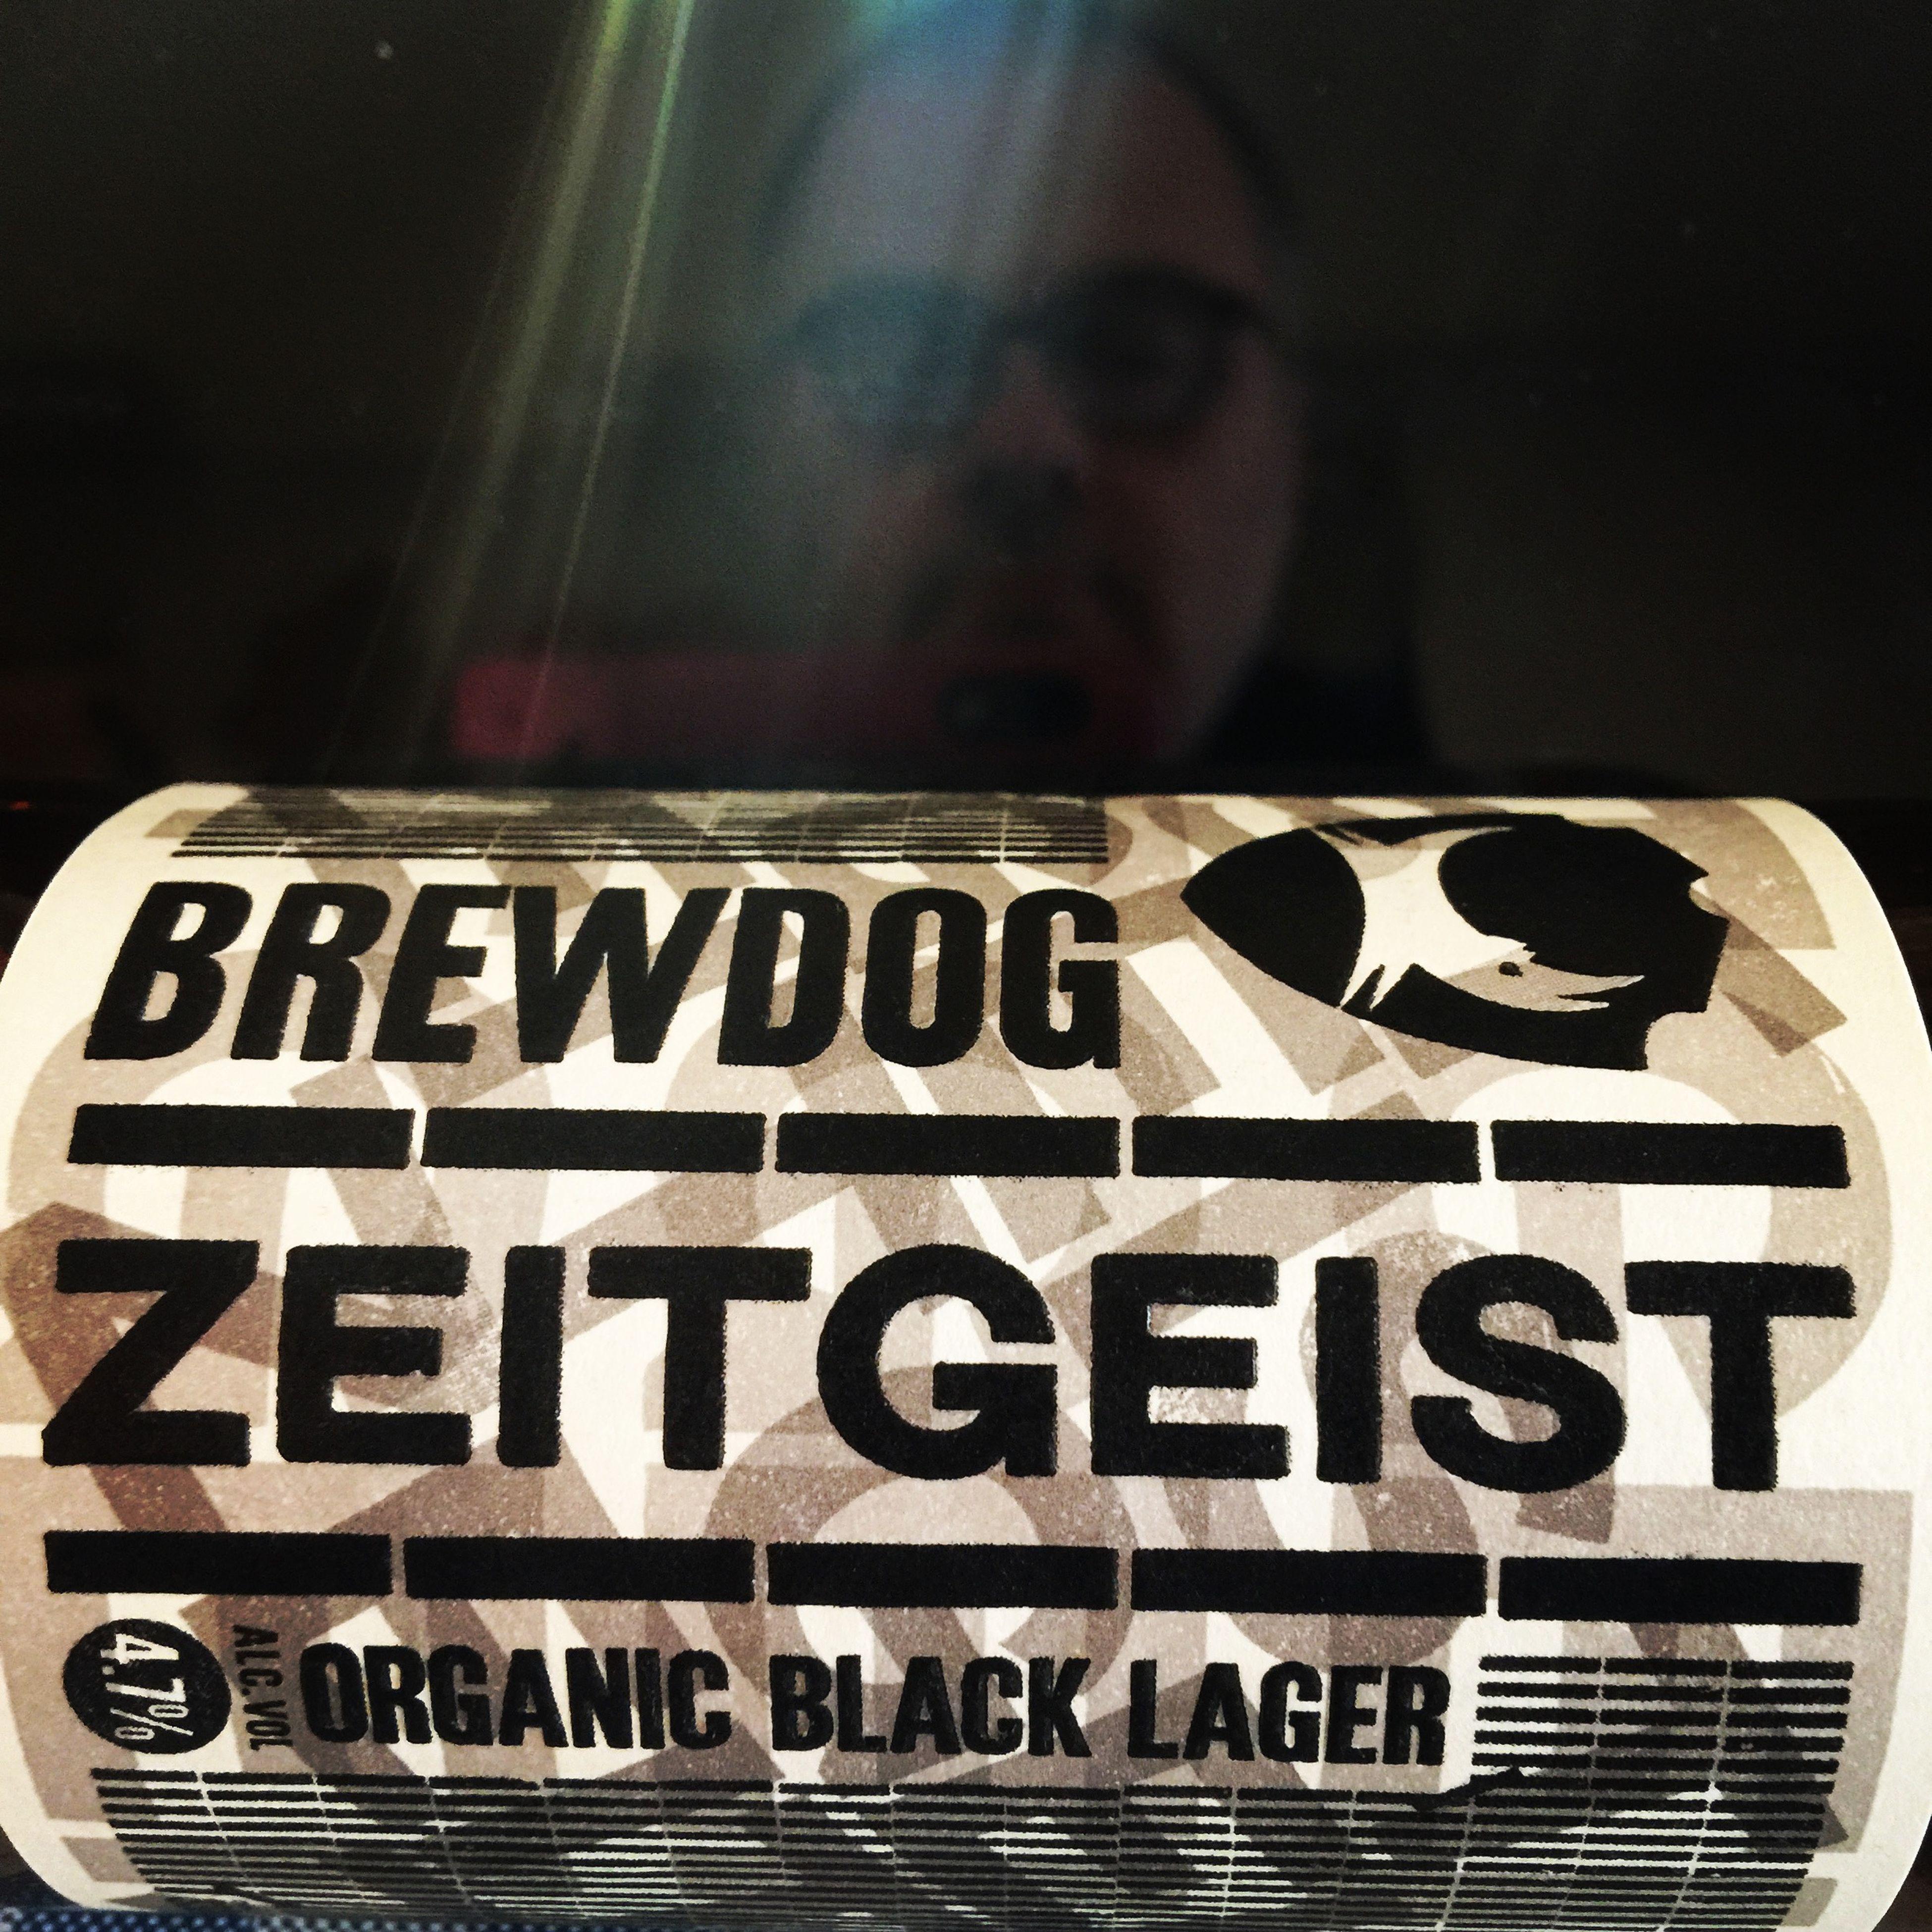 Yummy Beerporn